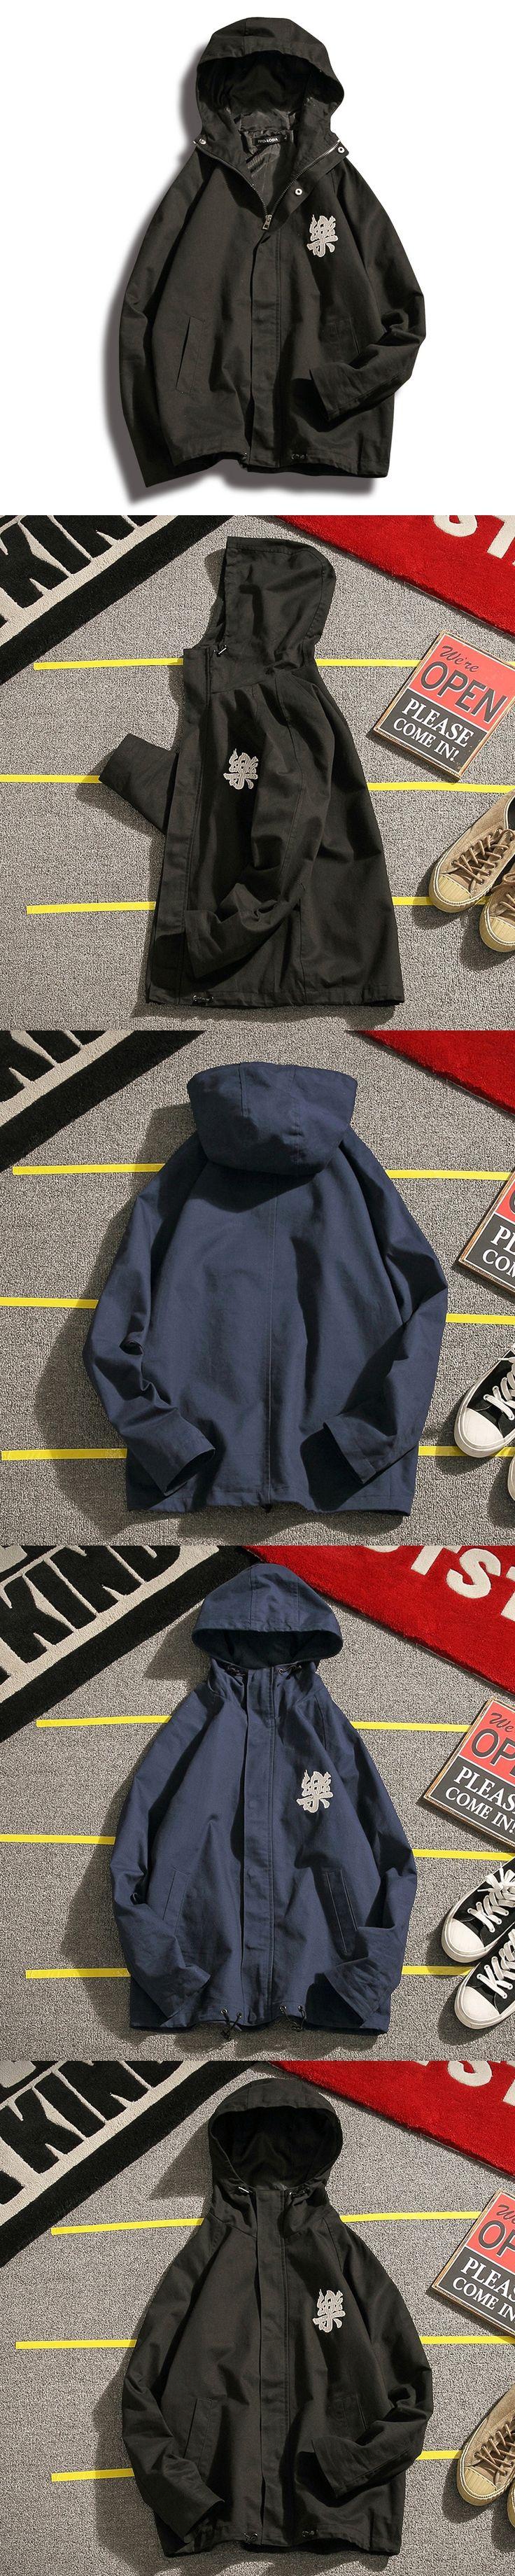 2017 Time-limited Promotion Jaqueta Masculino Jacket Men', Jacket, Young Man, Thin Coat, Vintage, Embroidery, Baseball Dress